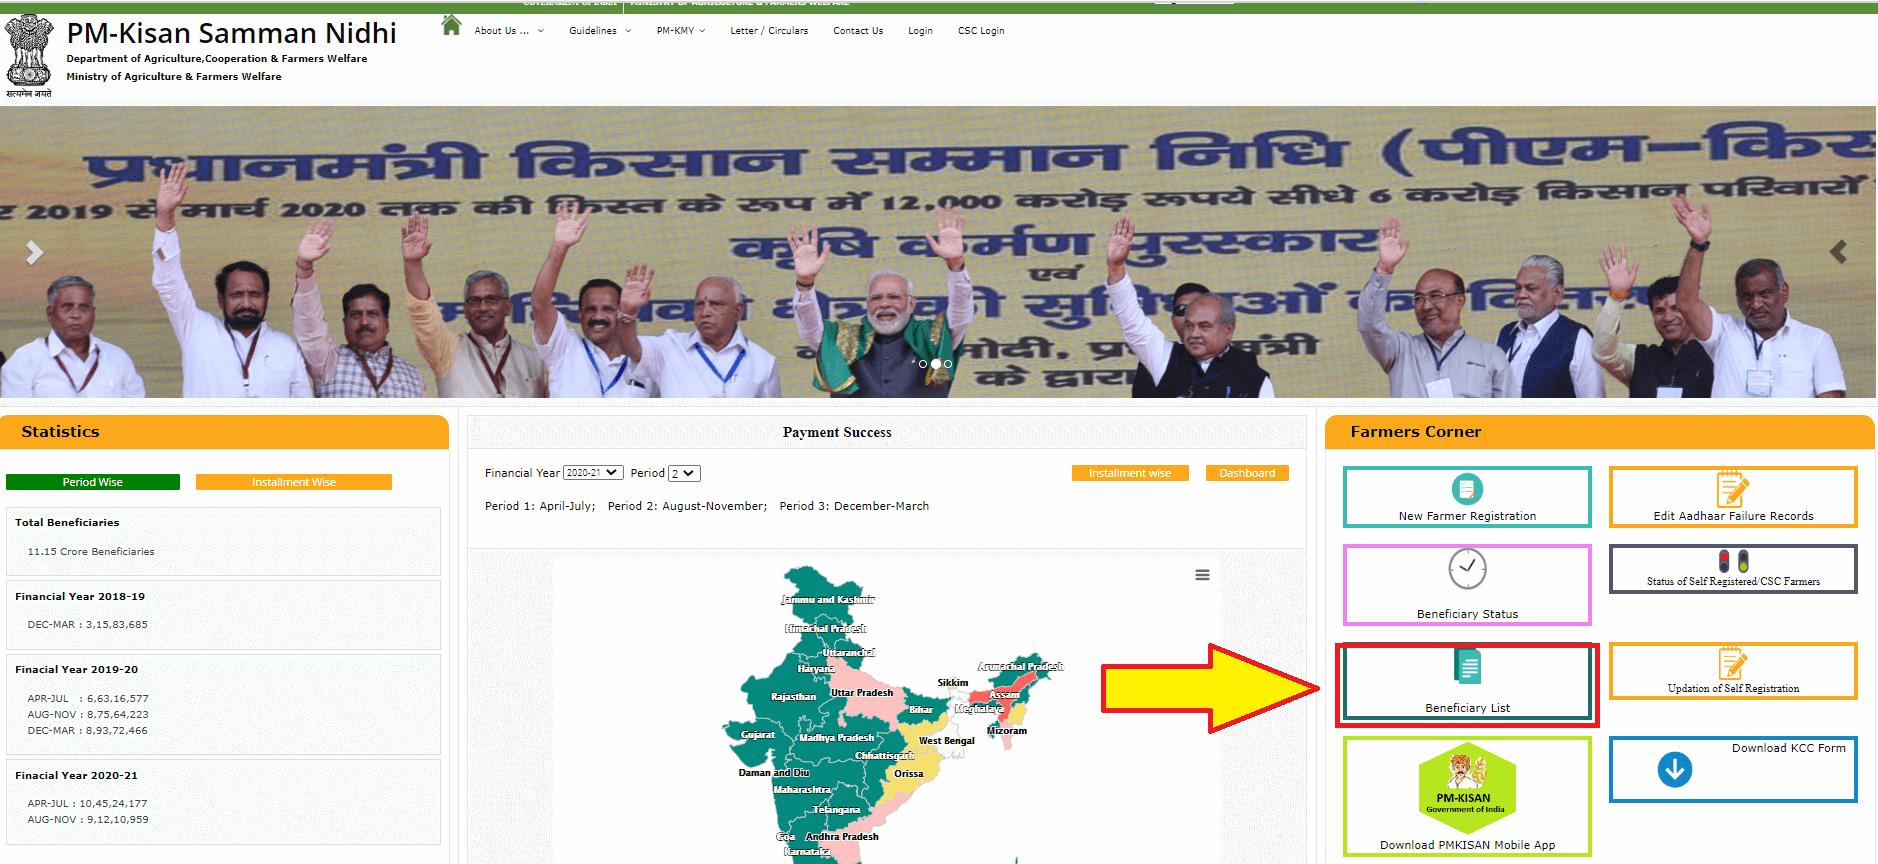 how to check pm kisan samman nidhi yojana status